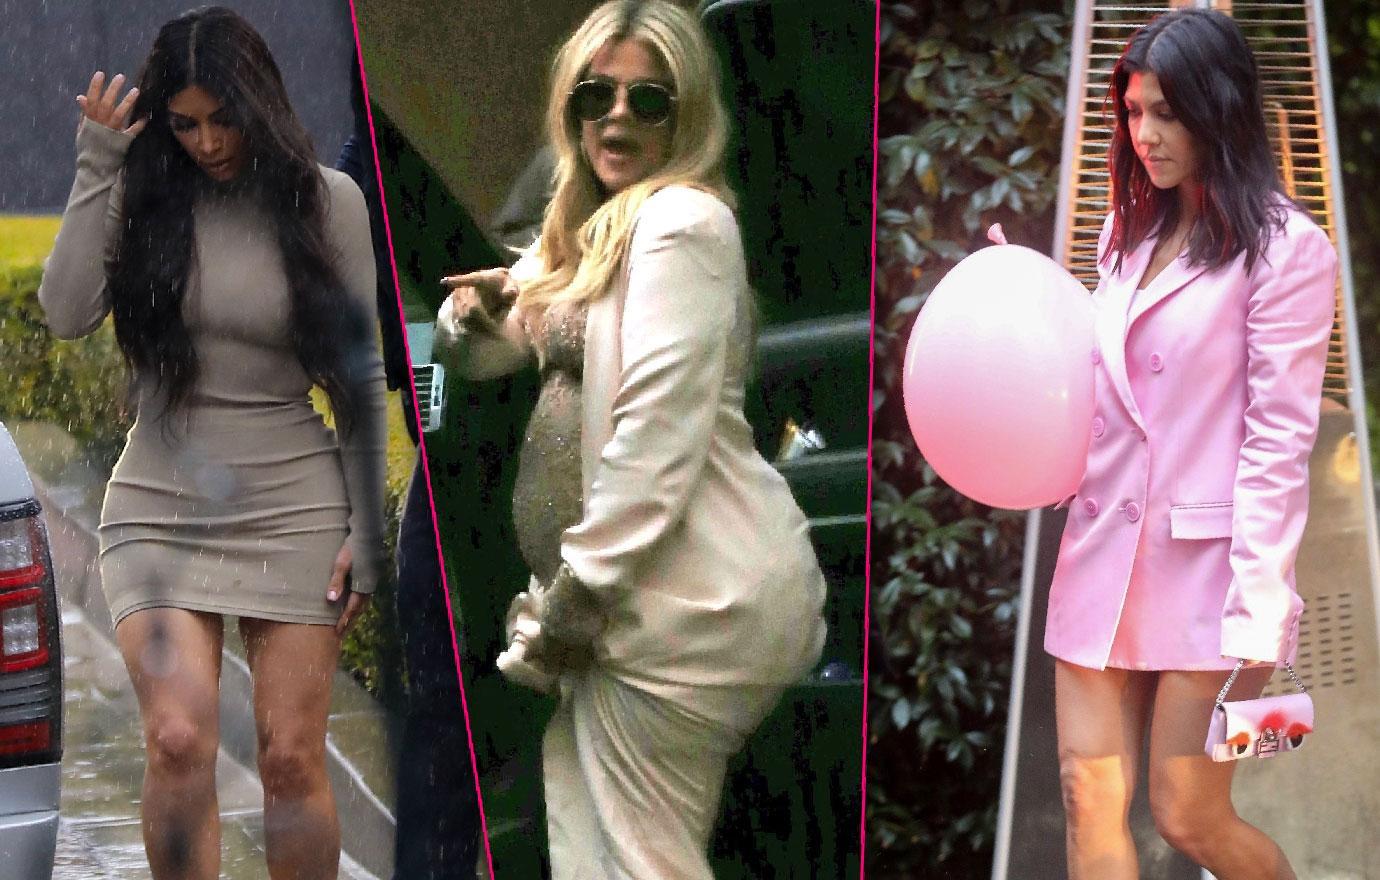 Kyle Richards Kim Zolciak Brielle Attend Khloe Kardashian Baby Shower